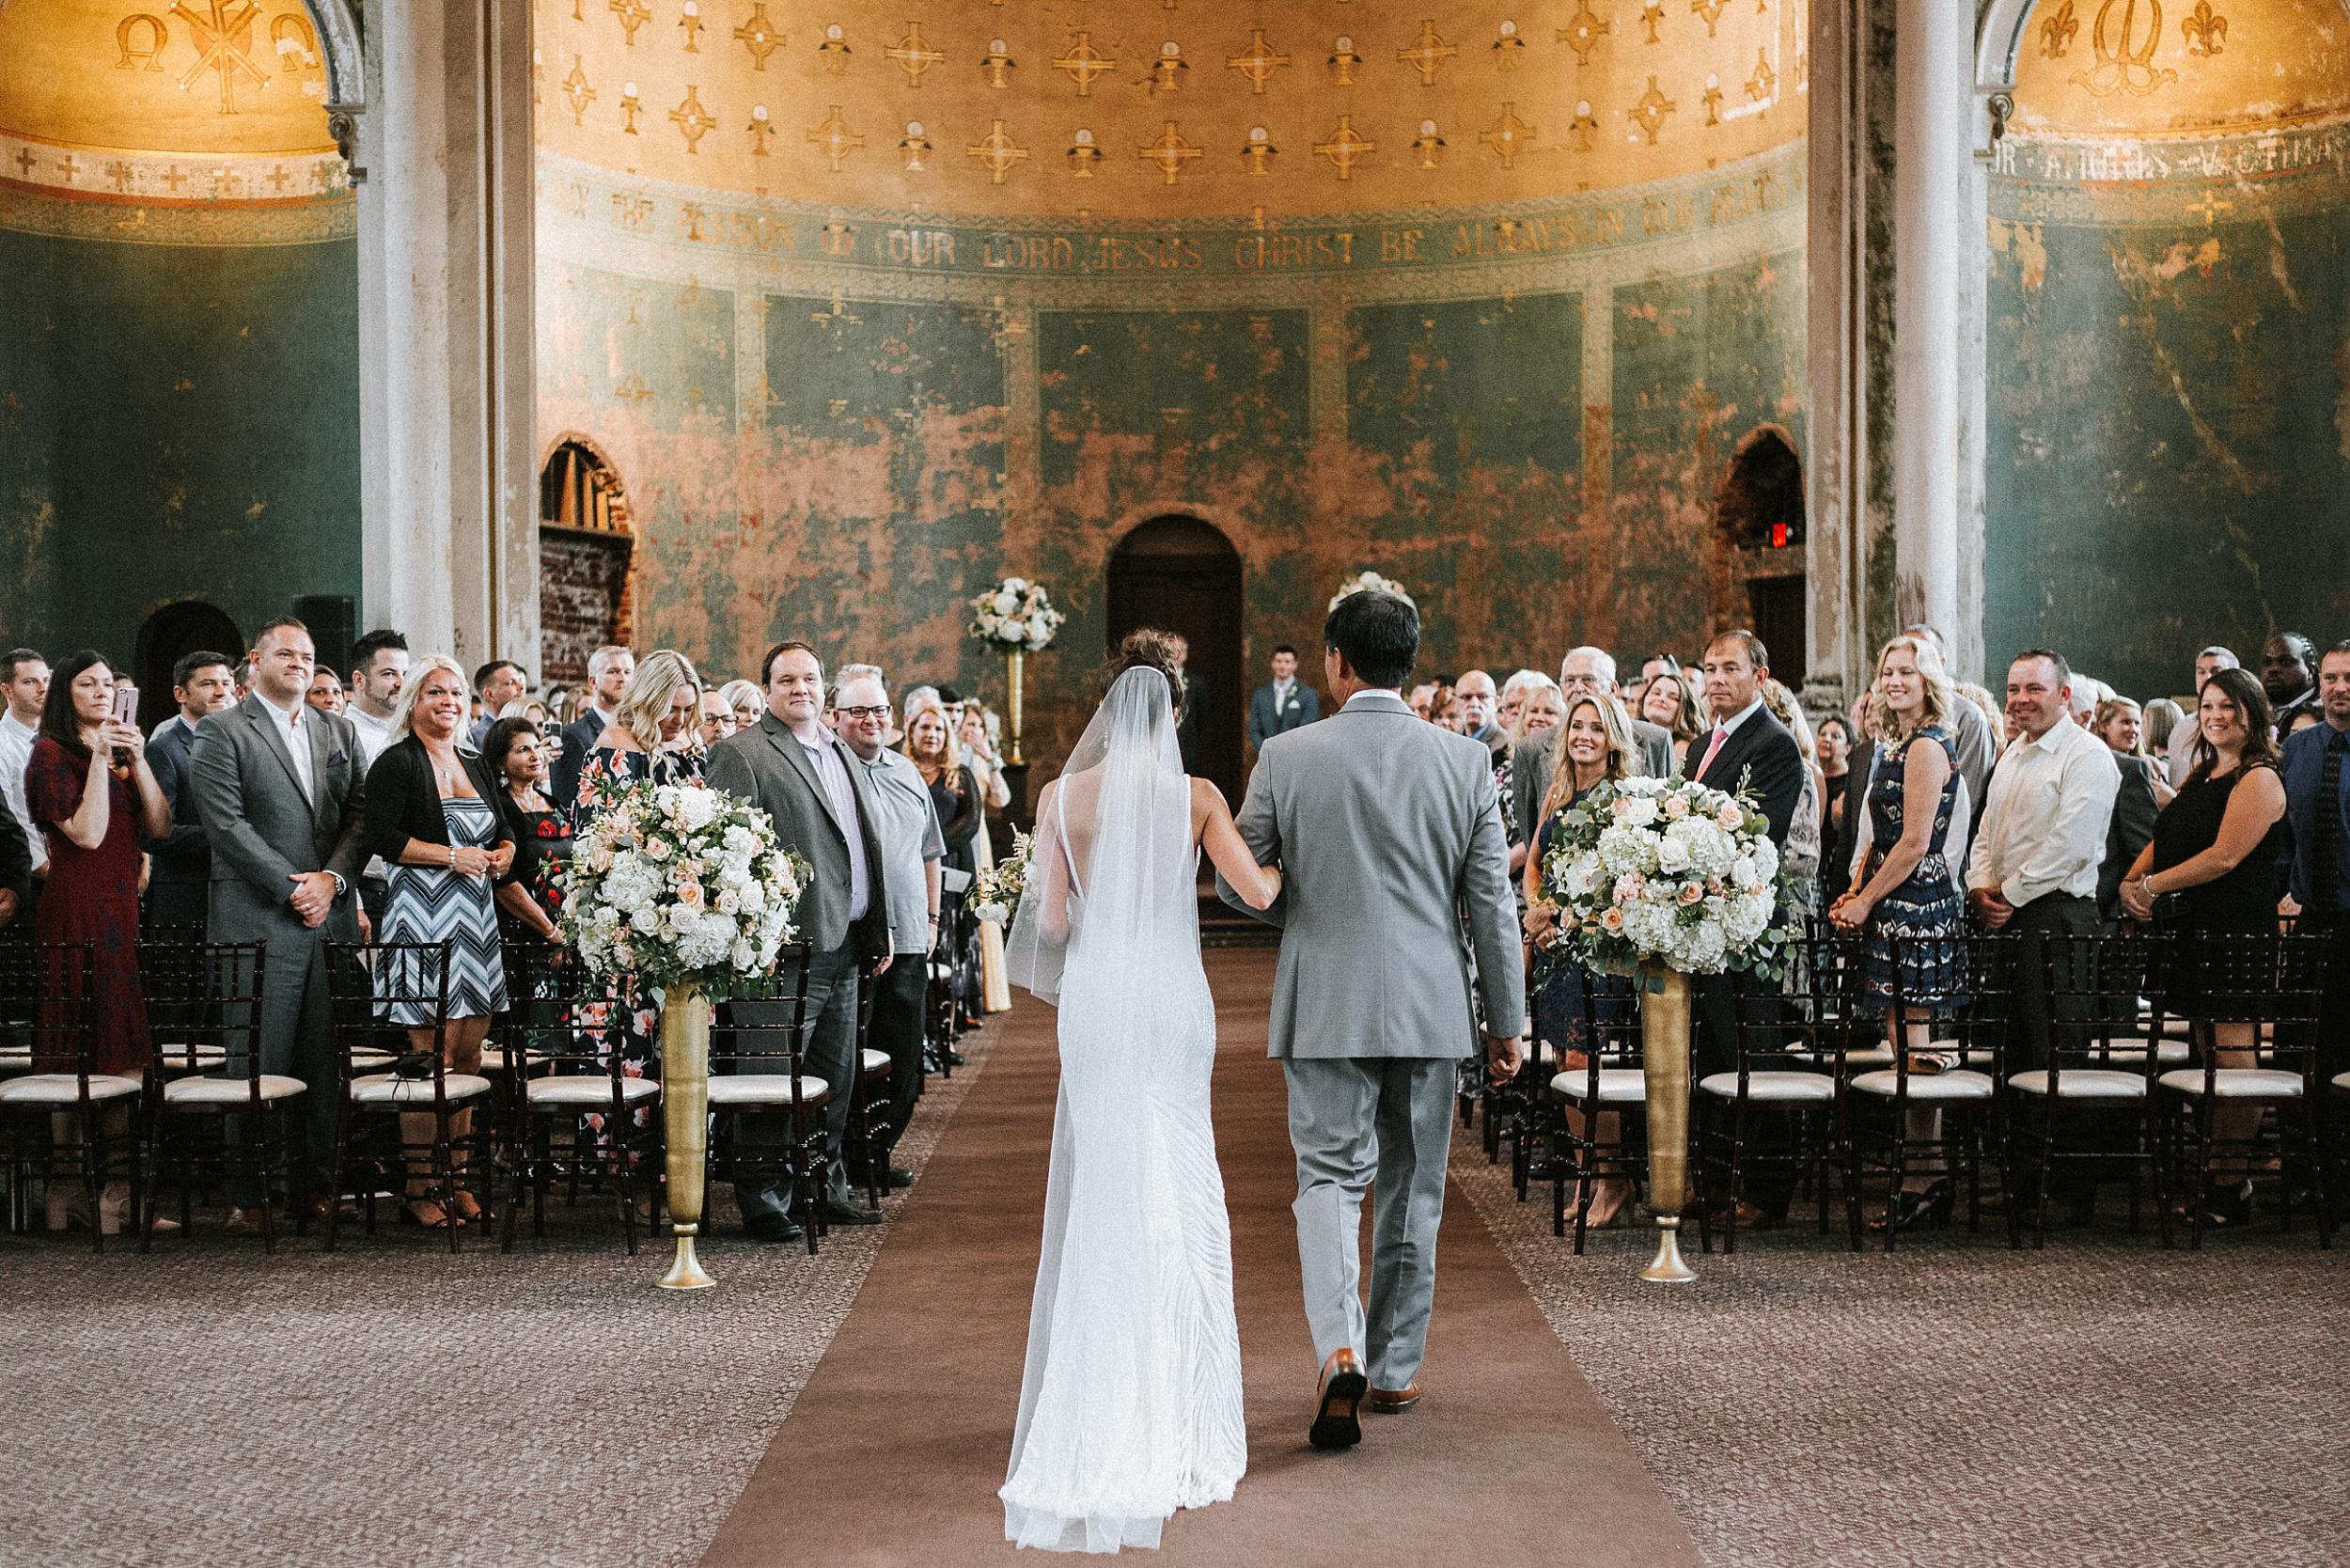 Brooke Townsend Photography - Cincinnati Wedding Photographer (113 of 170).jpg